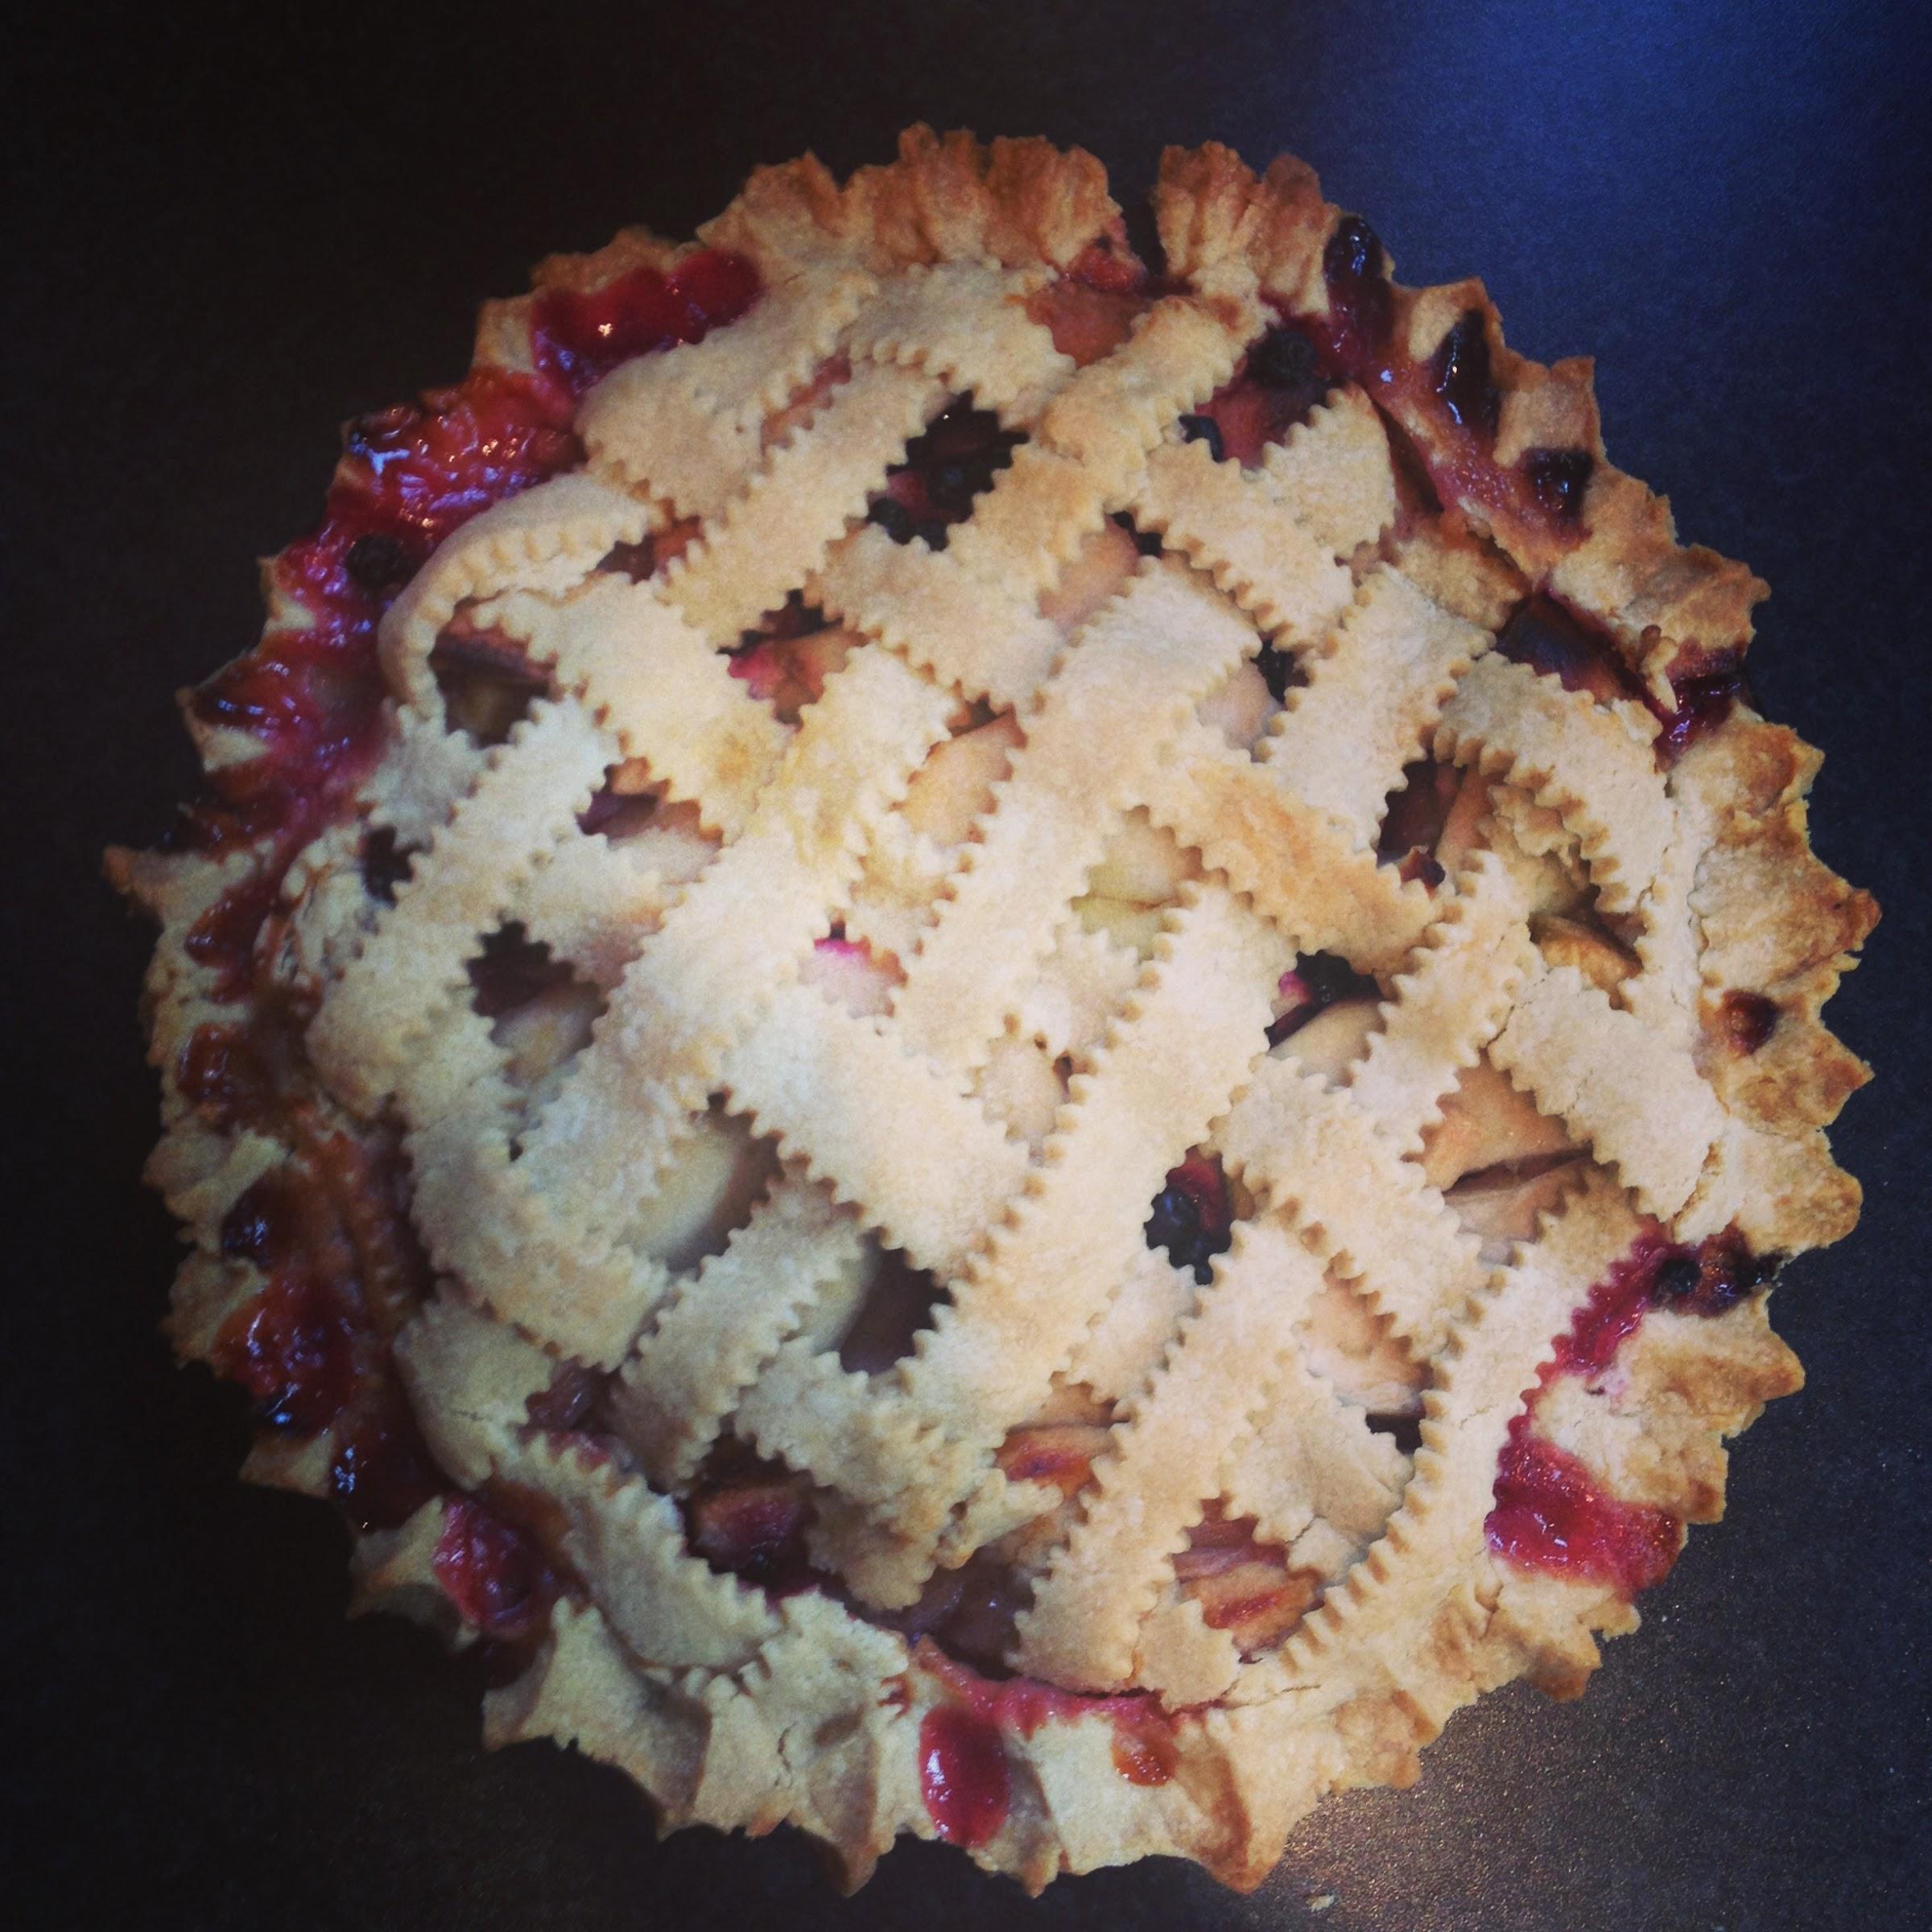 James Beard's large shortcrust pie pastry